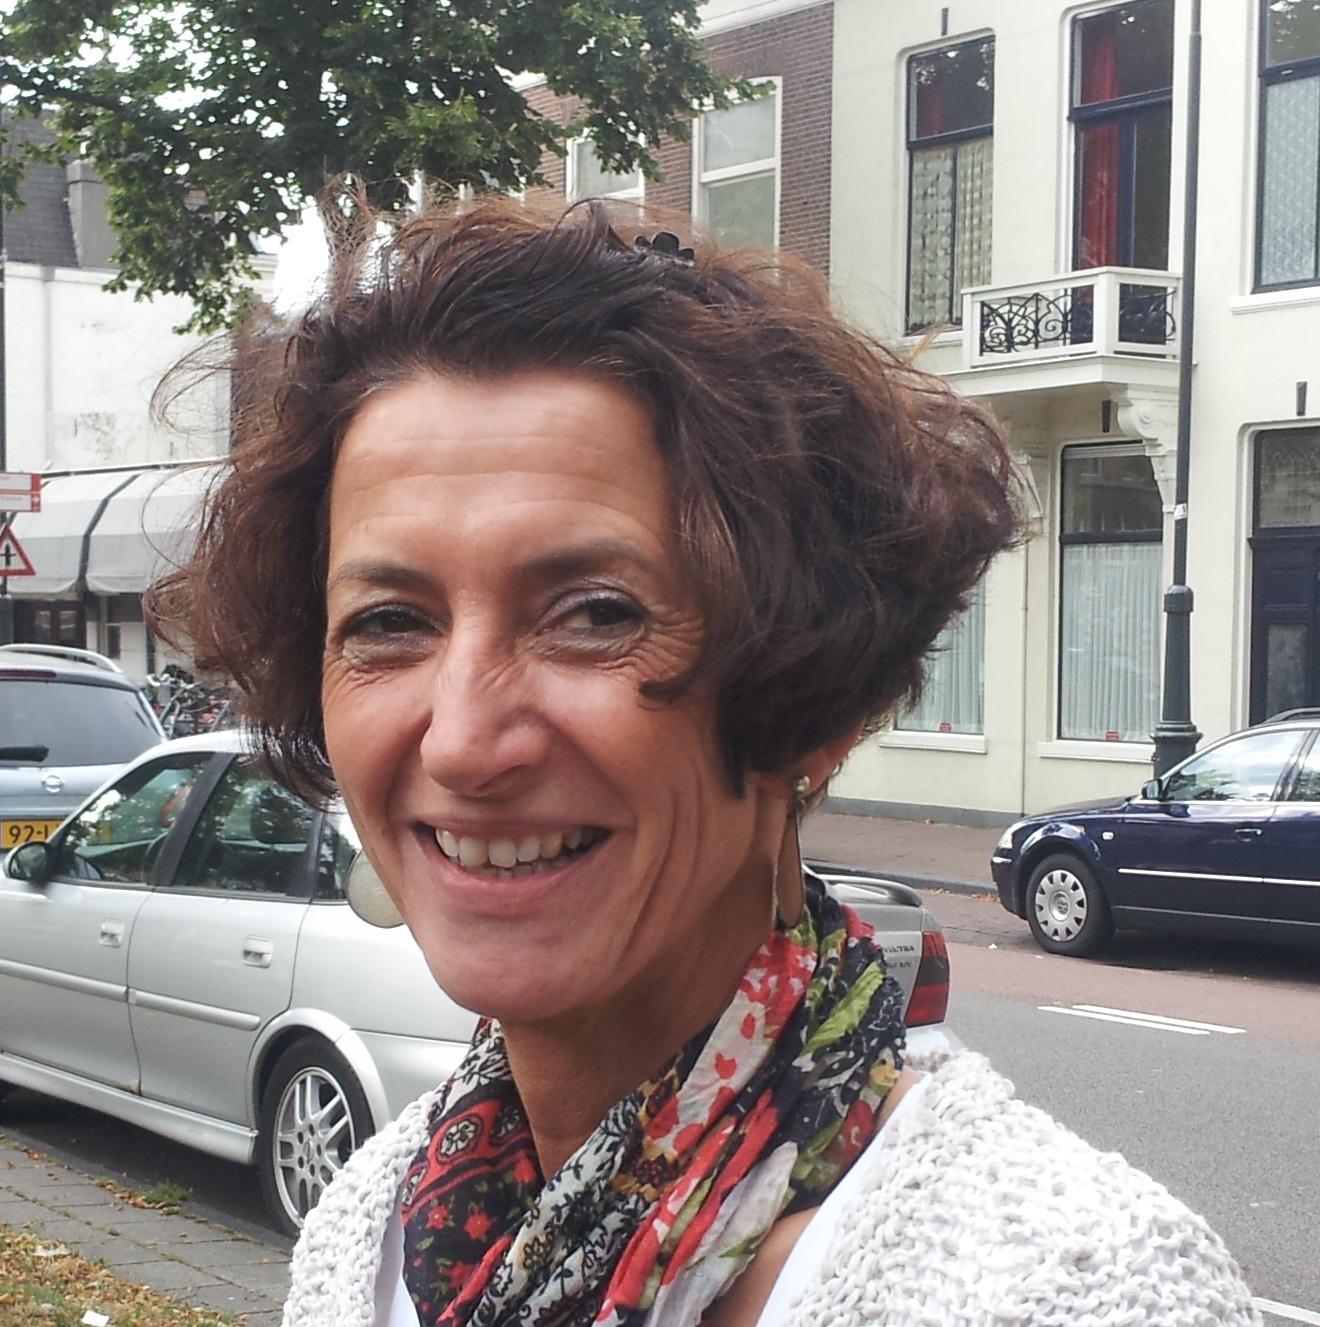 Tineke Snel